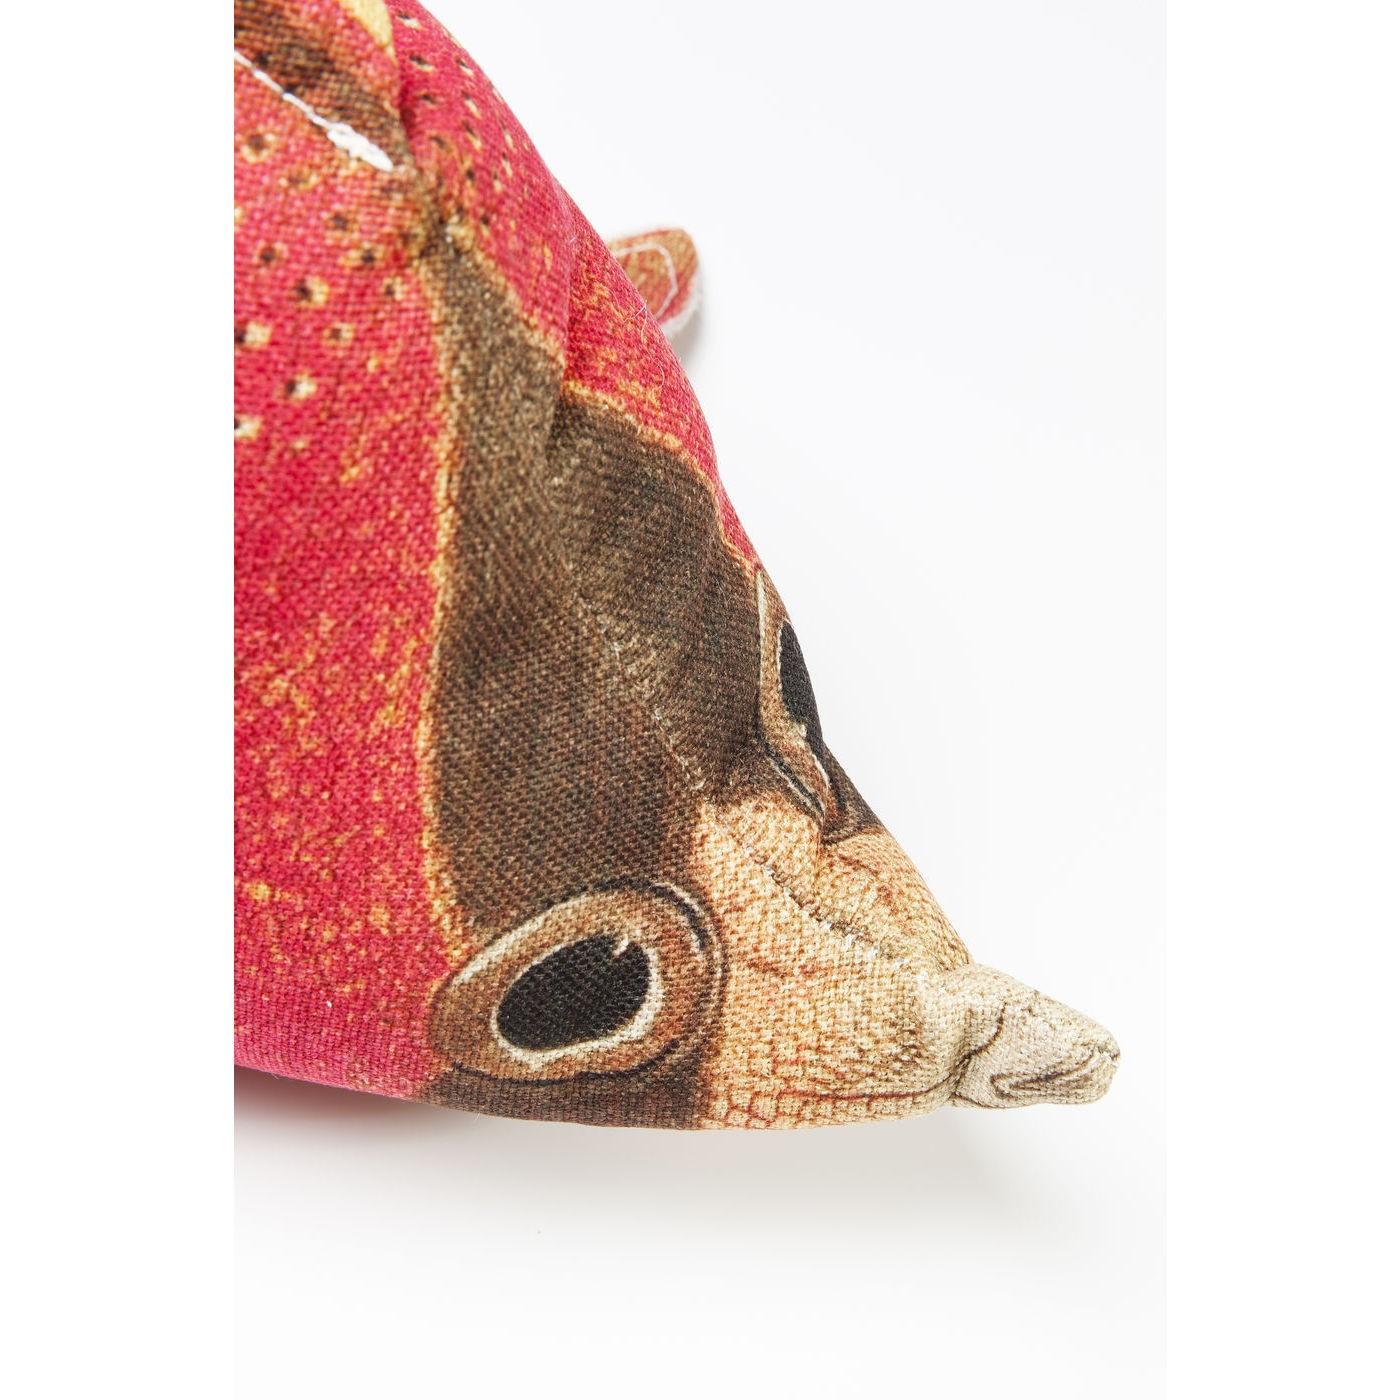 Coussin Shape Poisson rouge 33x62cm Kare Design